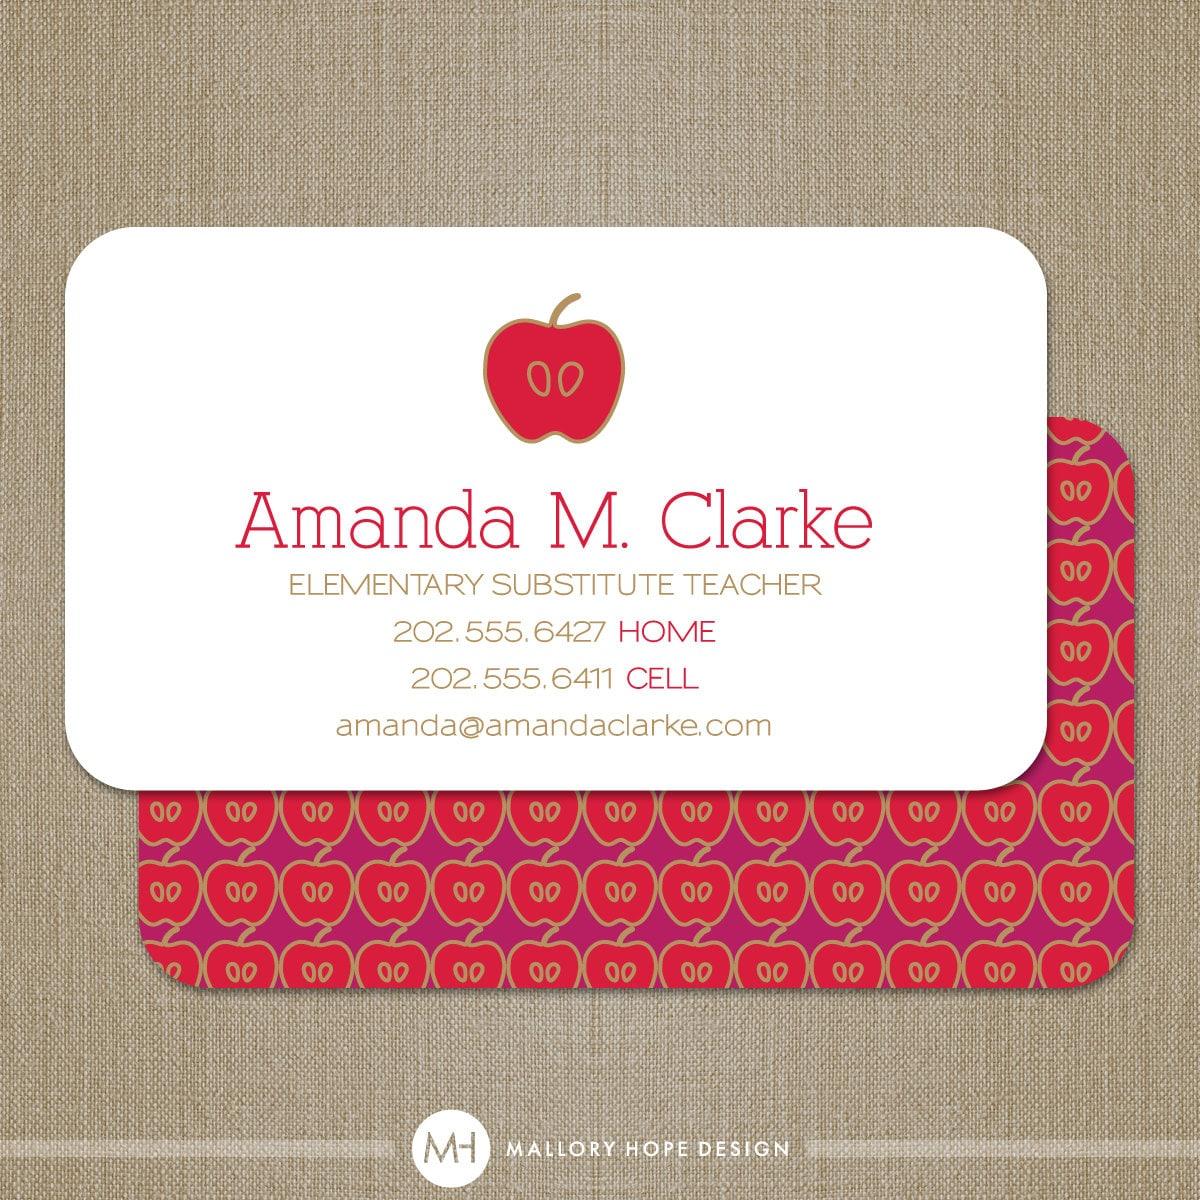 teacher id card template - teacher substitute quotes just b cause